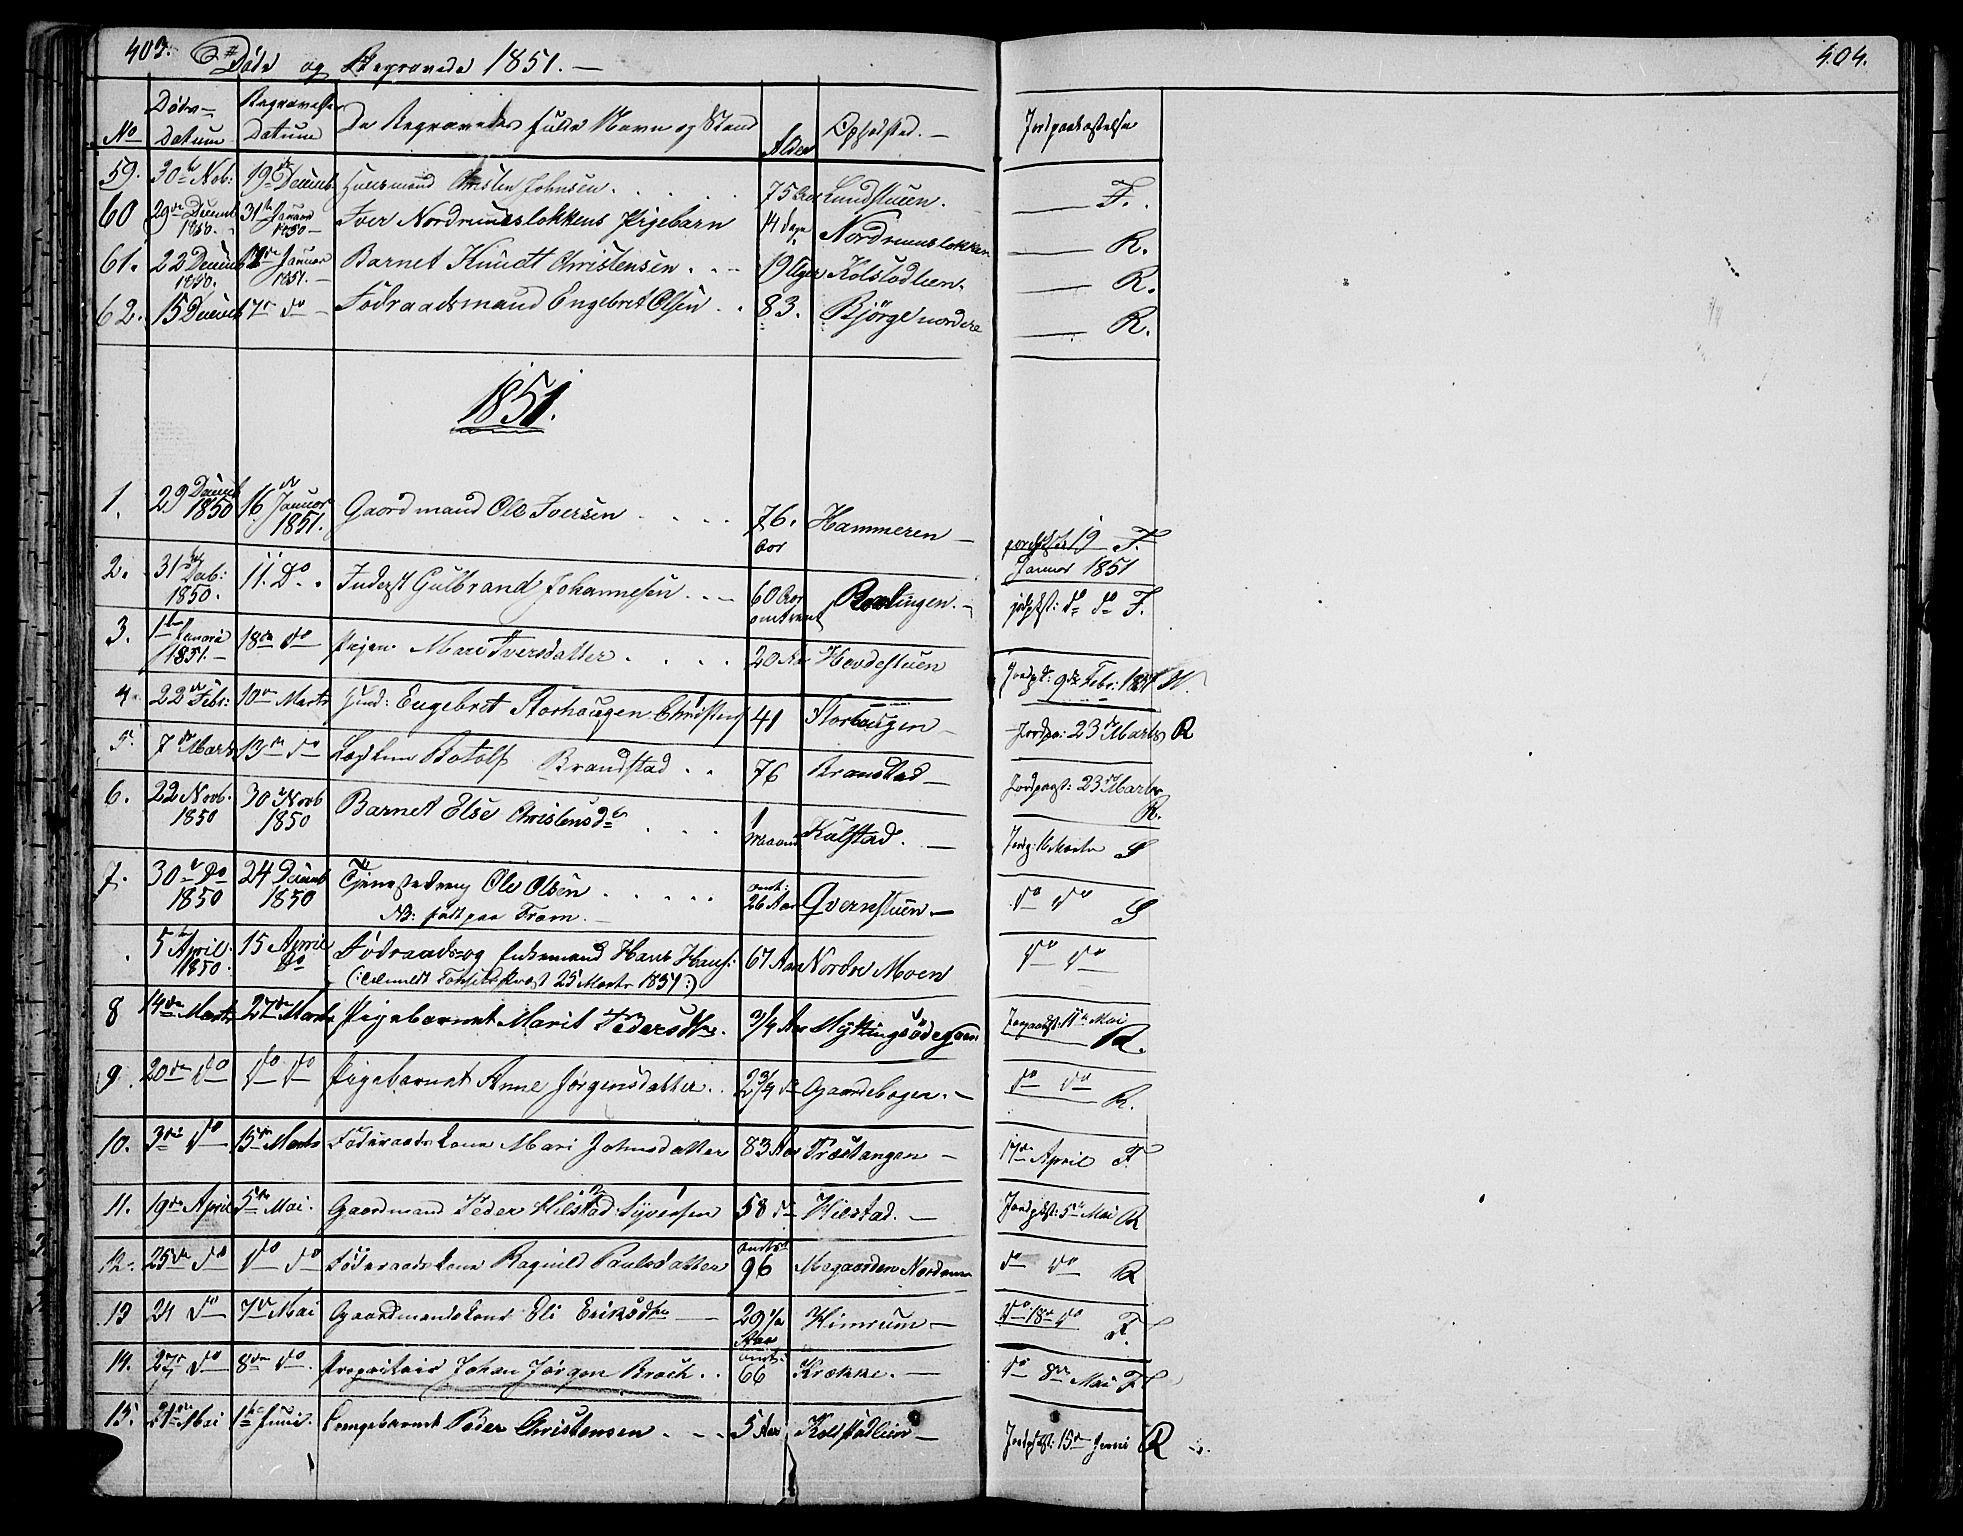 SAH, Ringebu prestekontor, Klokkerbok nr. 2, 1839-1853, s. 403-404